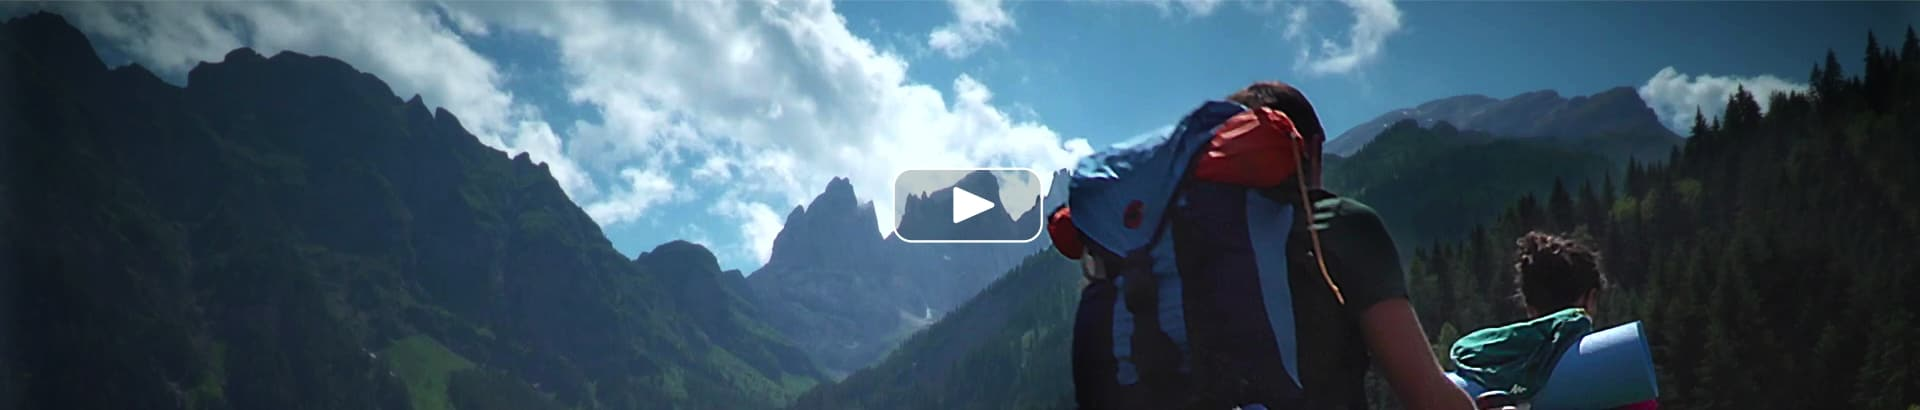 Dolomiti Hike & Camp Video Intro